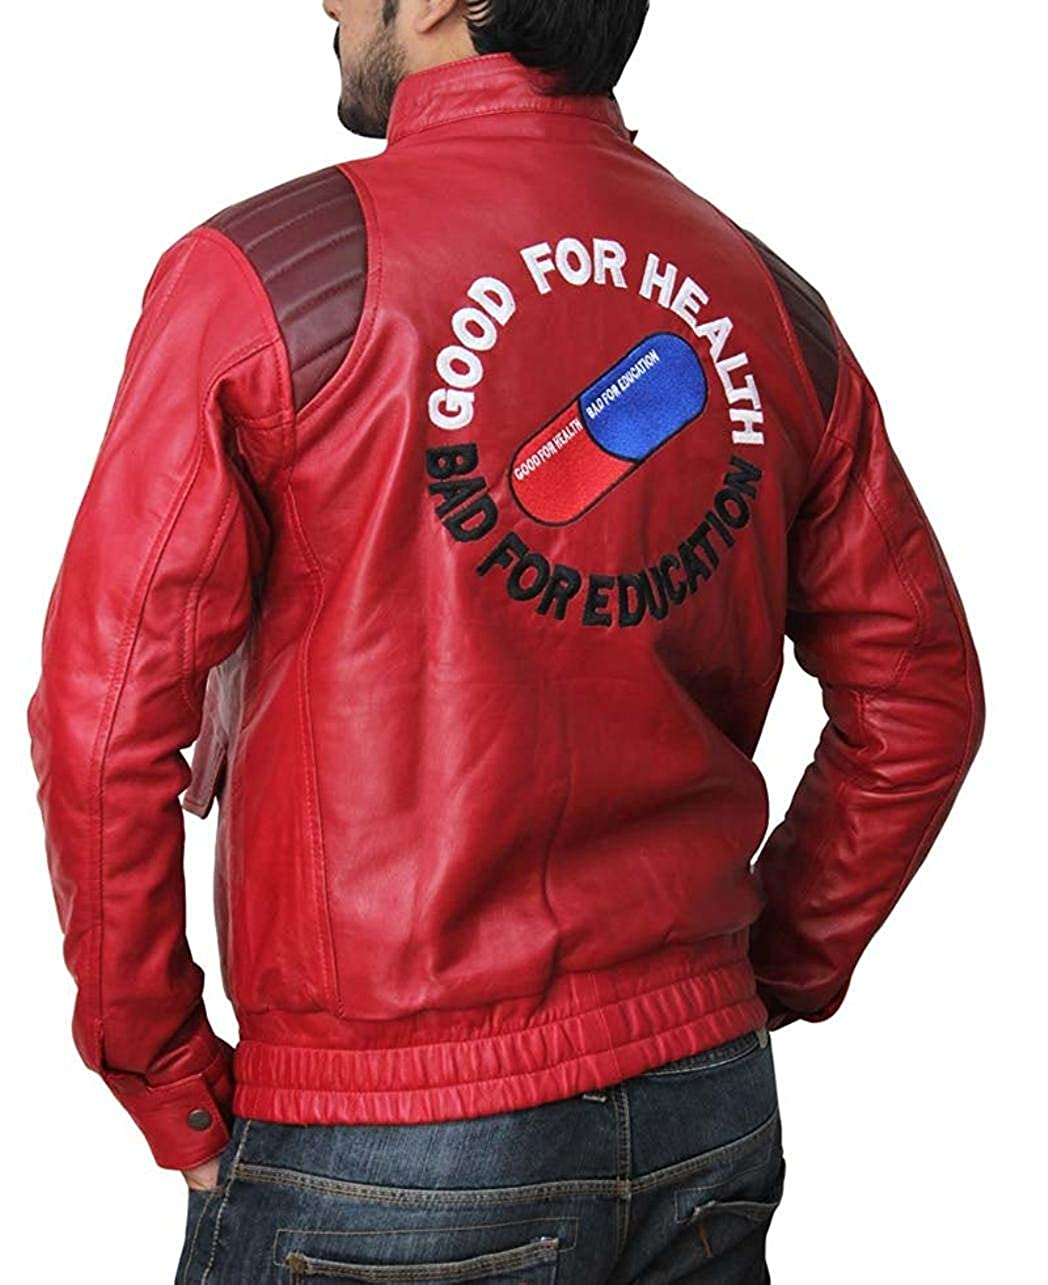 Decrum Superhero Costume Jacket Mens - Cosplay Leather Jackets & Coat for Adult